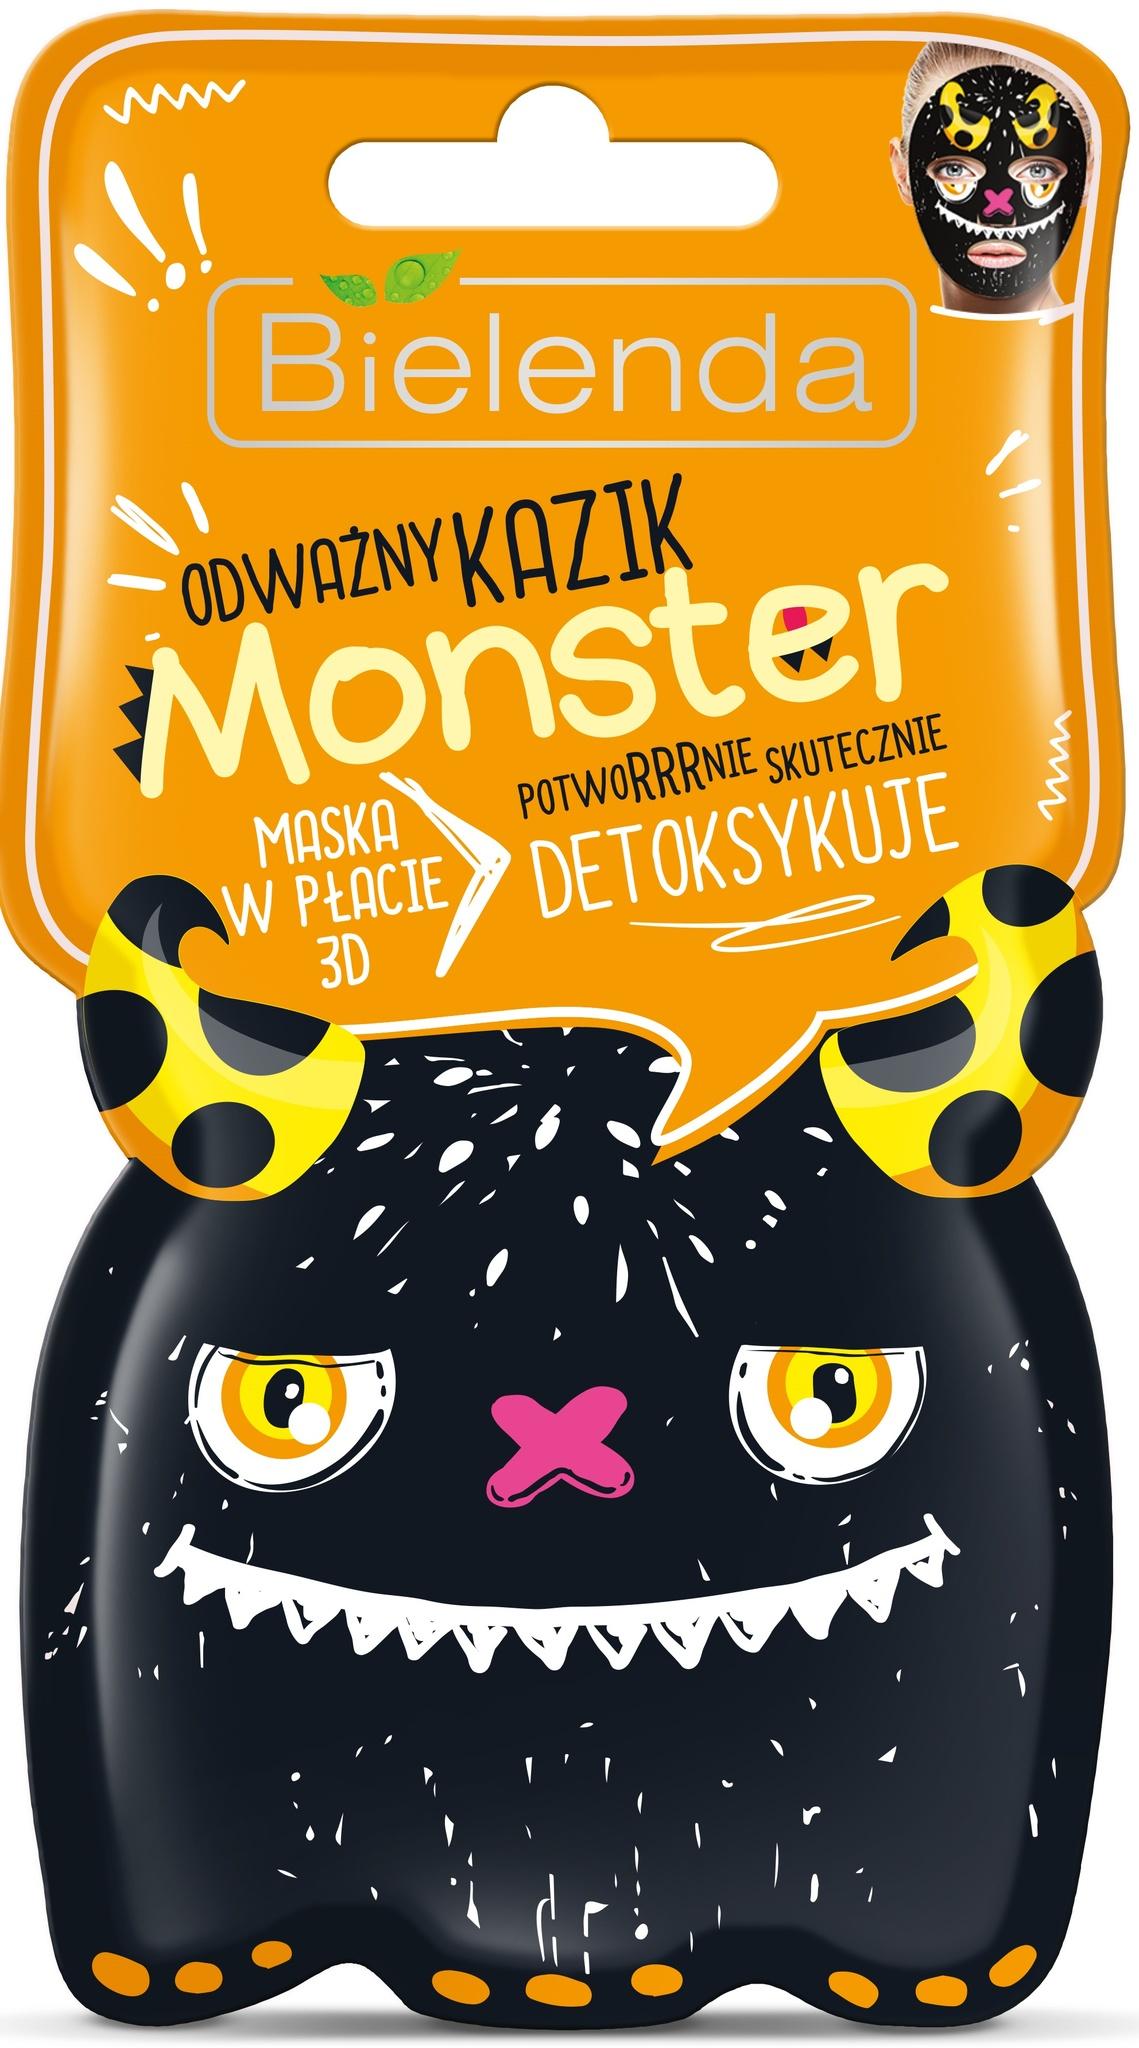 MONSTER маска тканевая 3D Храбрый Казимир детокс 1шт